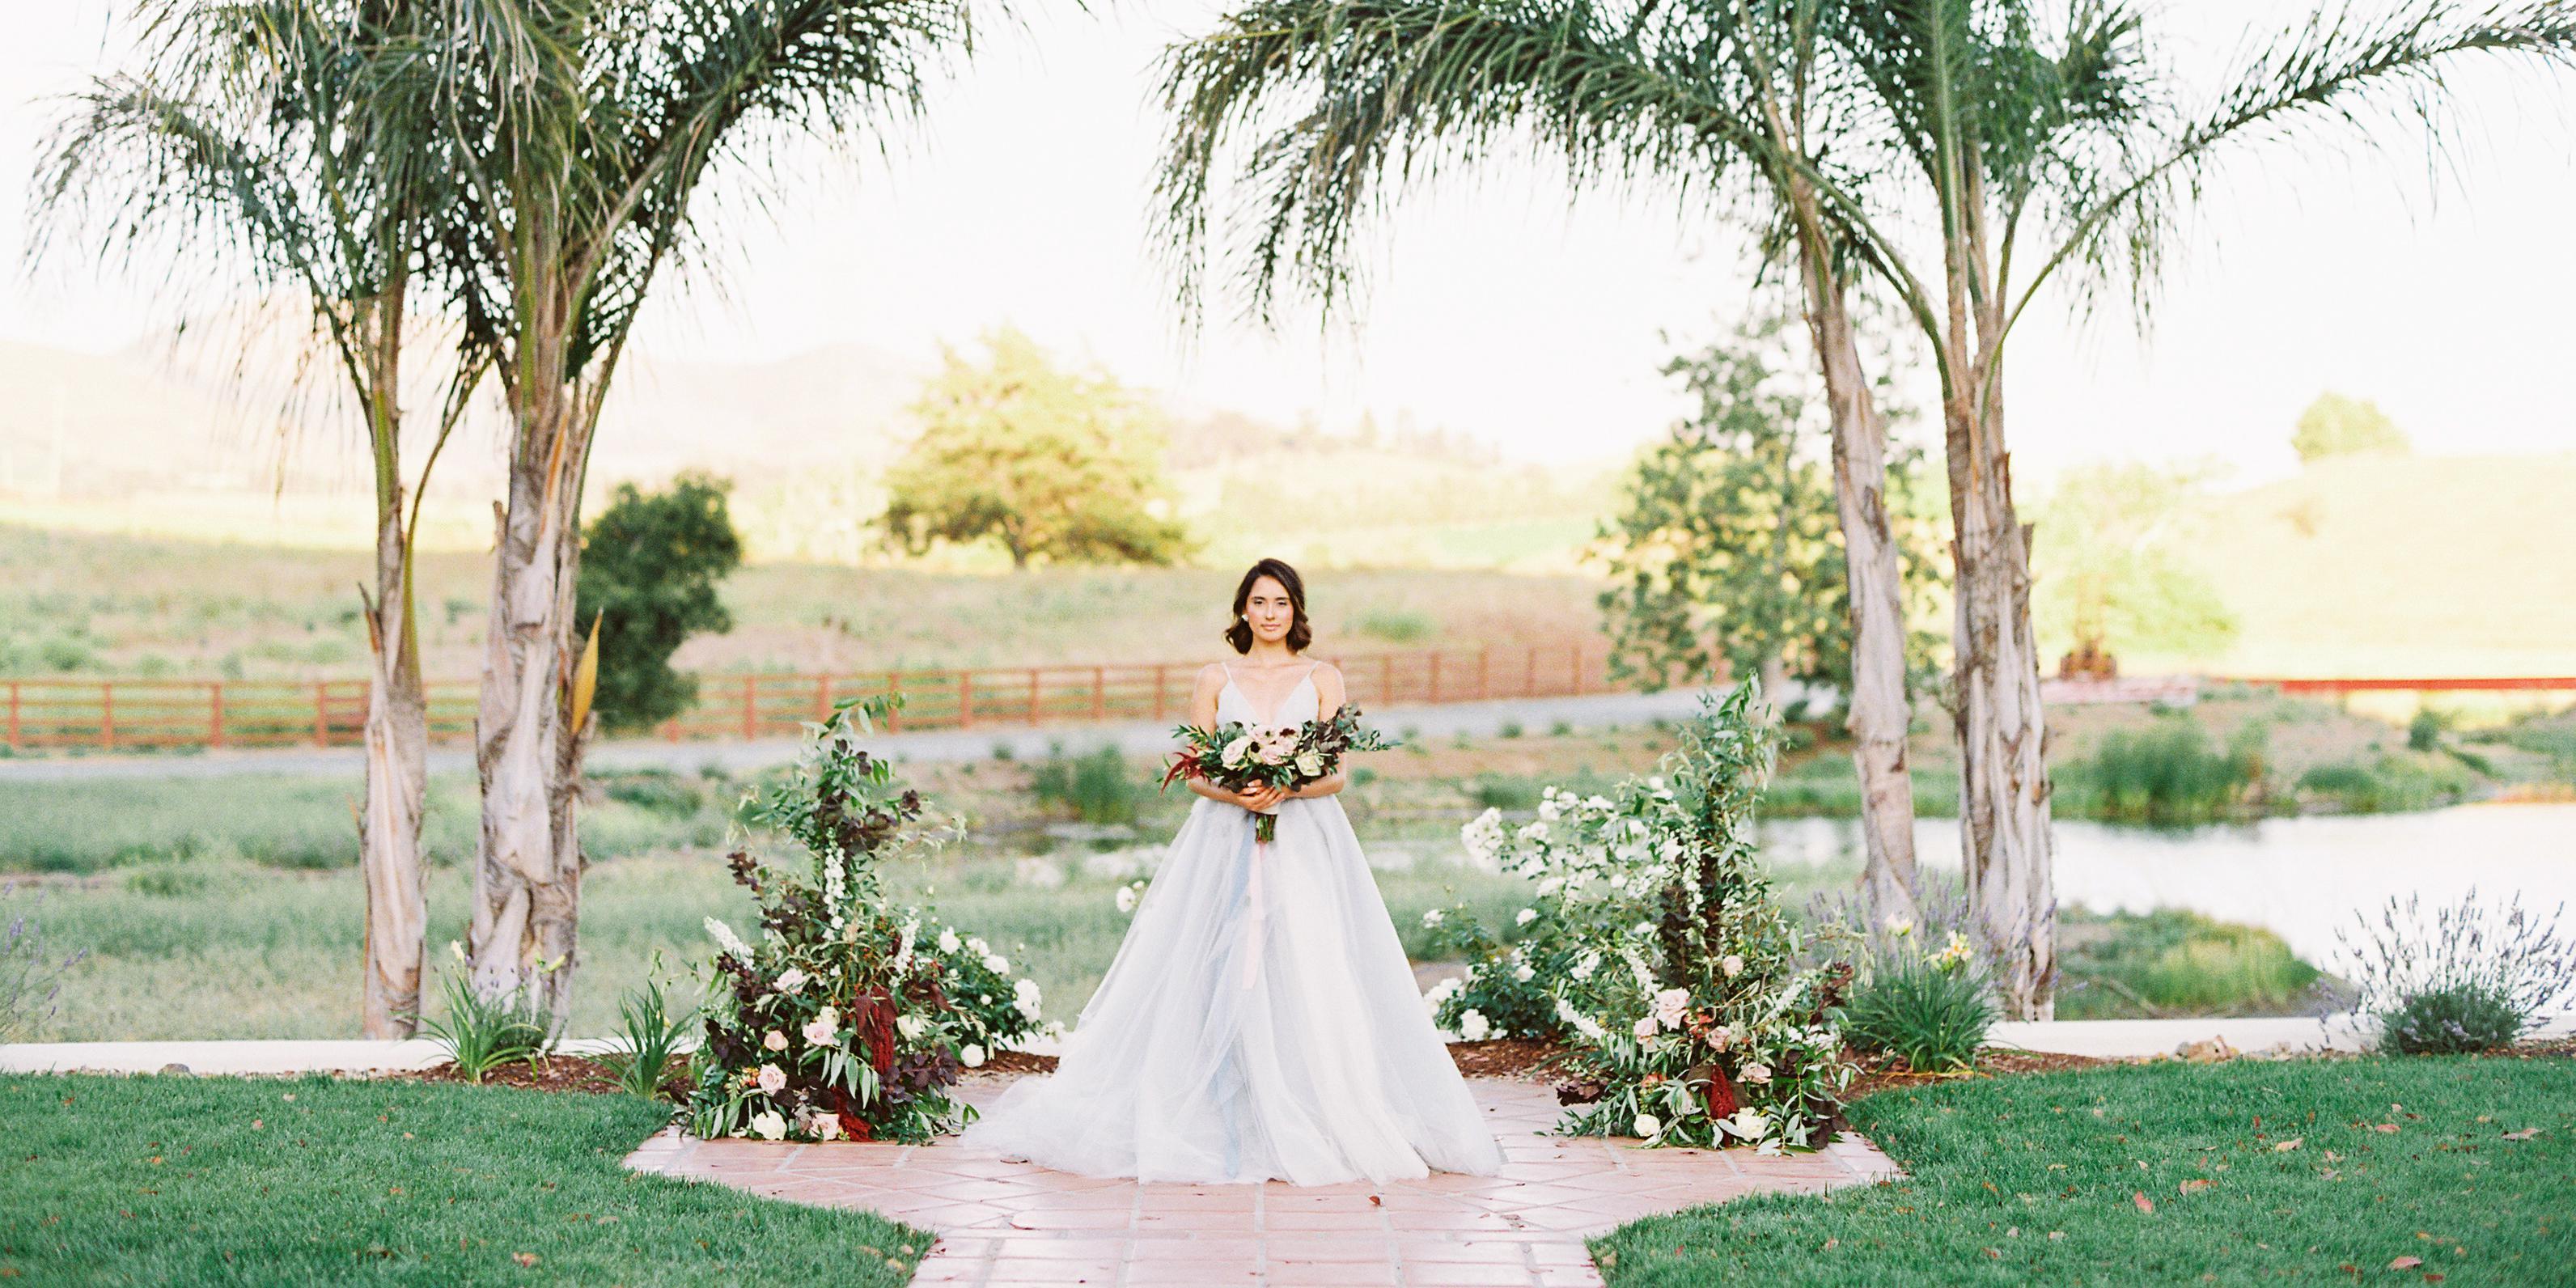 La Lomita Ranch Venue San Luis Obispo Price It Out,New York City Hall Wedding Dresses